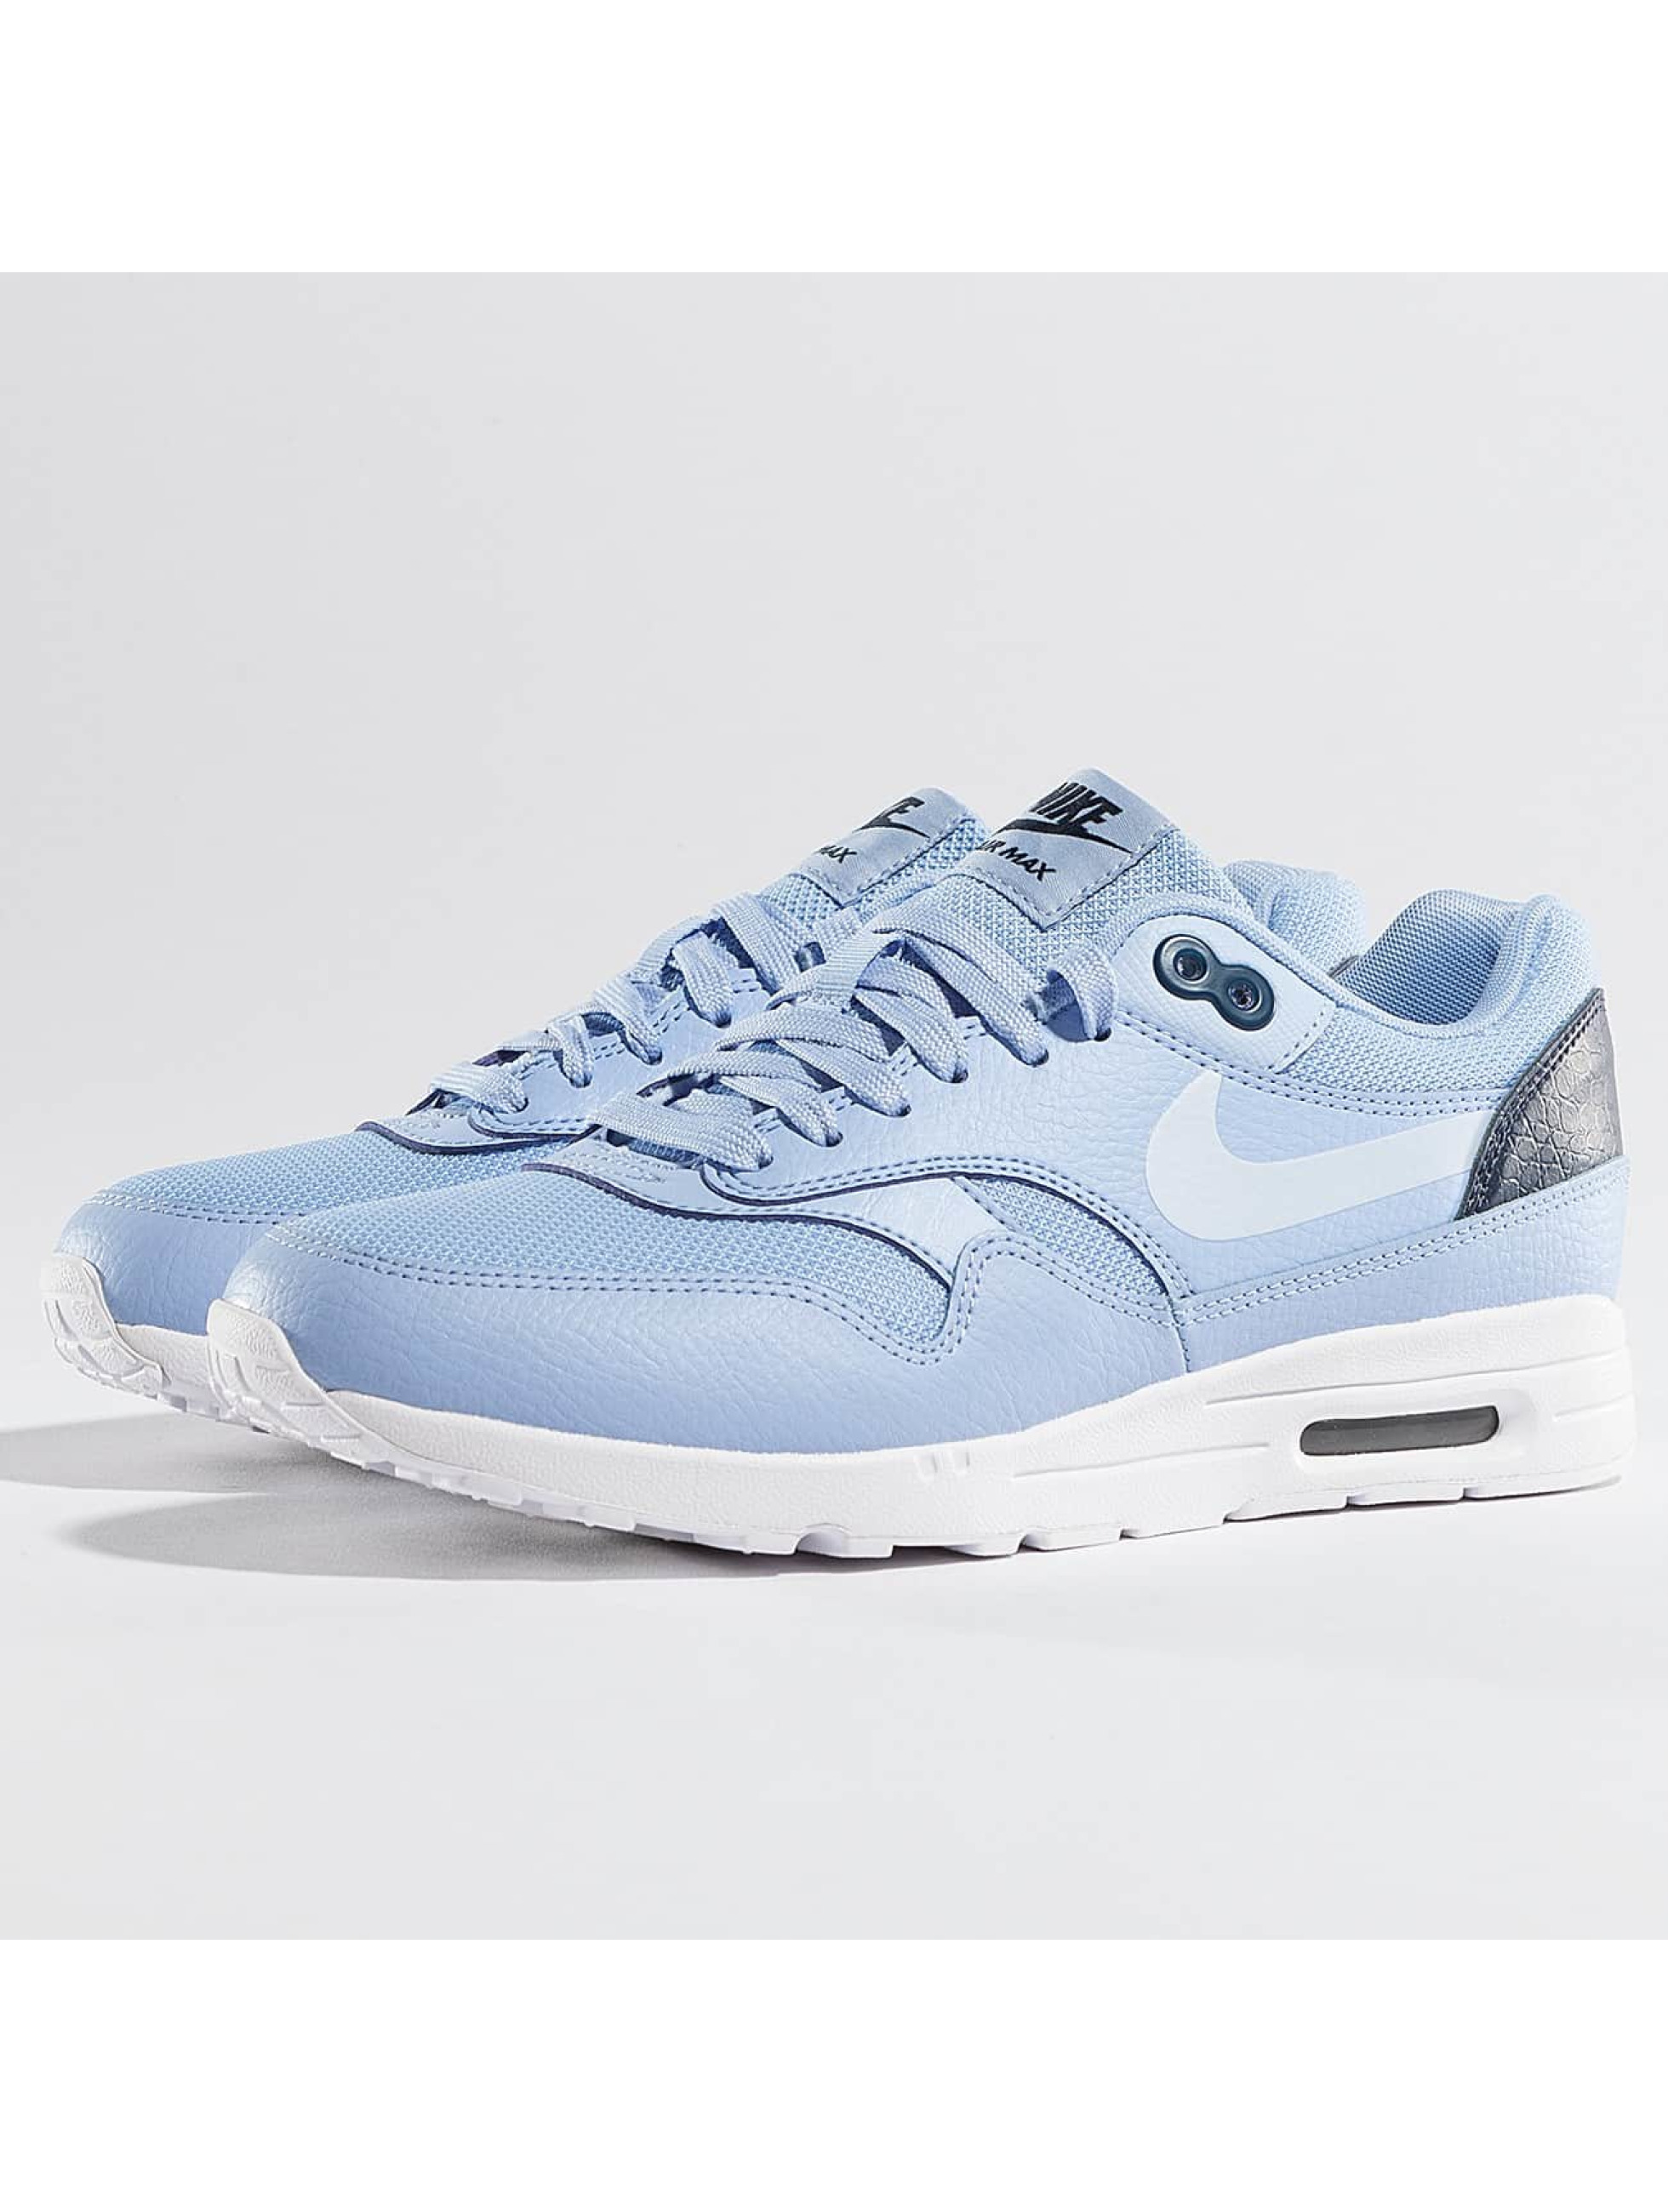 Nike Frauen Sneaker Women´s Air Max 1 Ultra 2.0 in blau